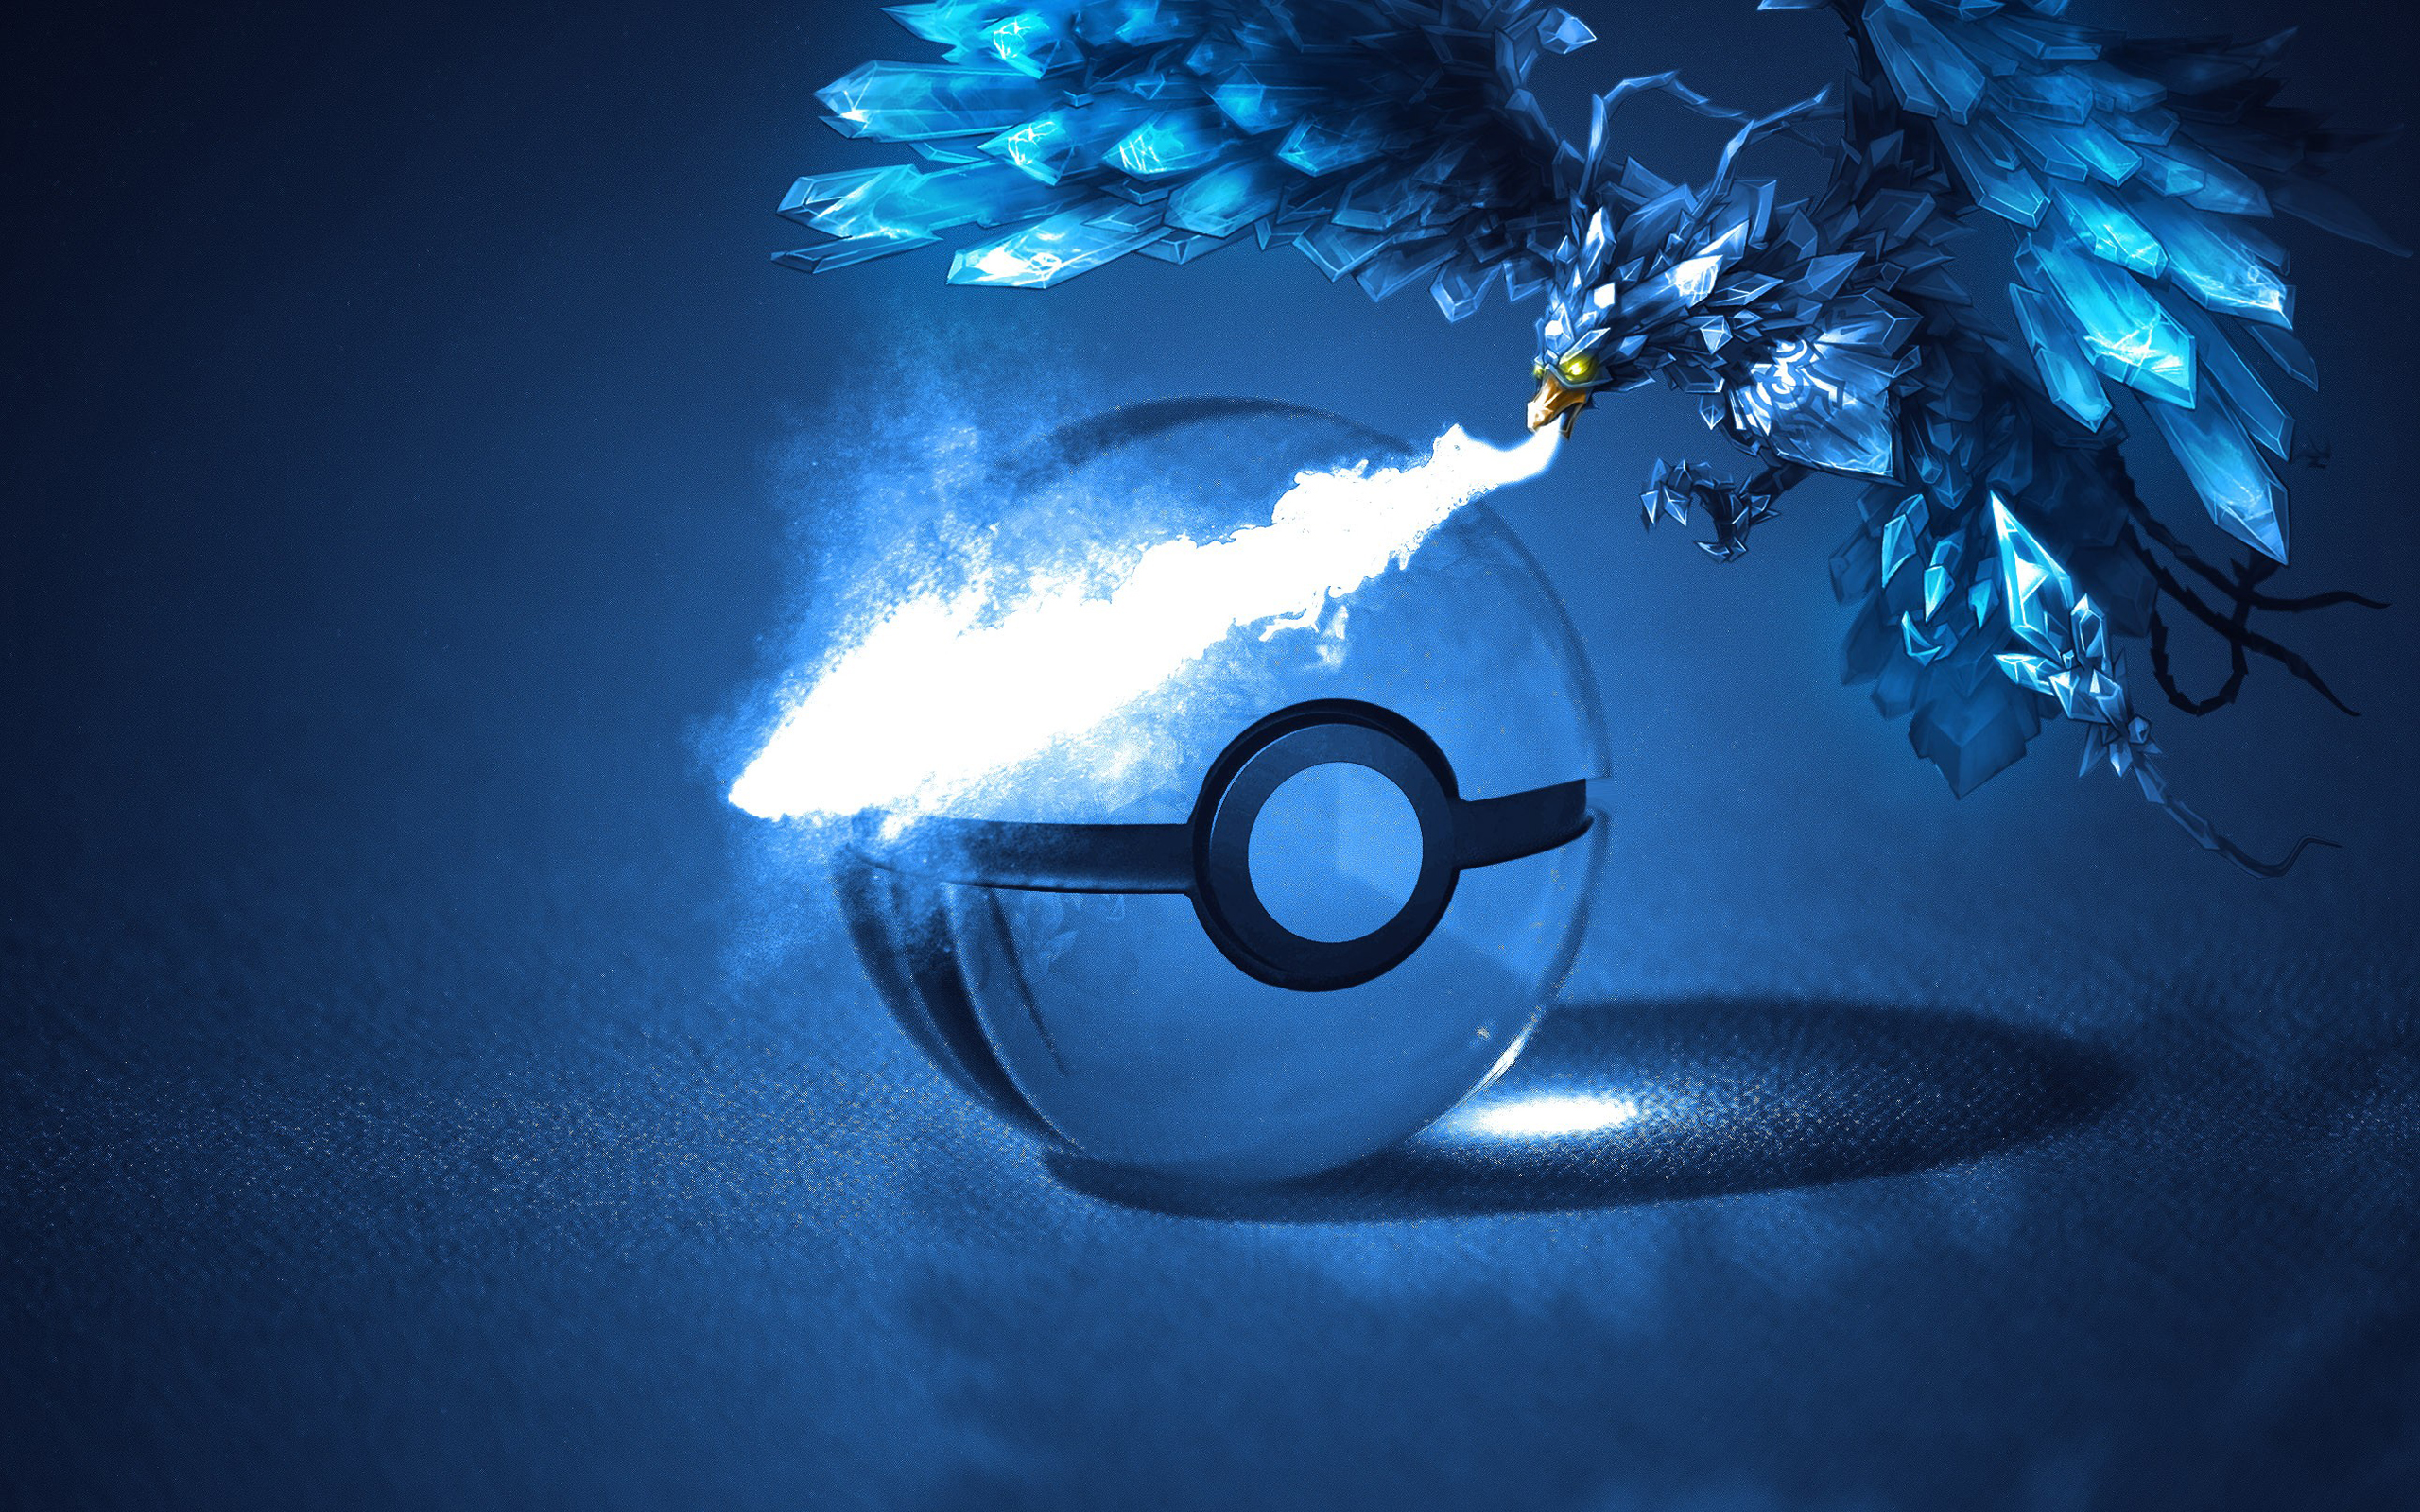 Articuno Pokemon Pokeball Wallpaper Resolution 2560x1600 Id 780333 Wallha Com